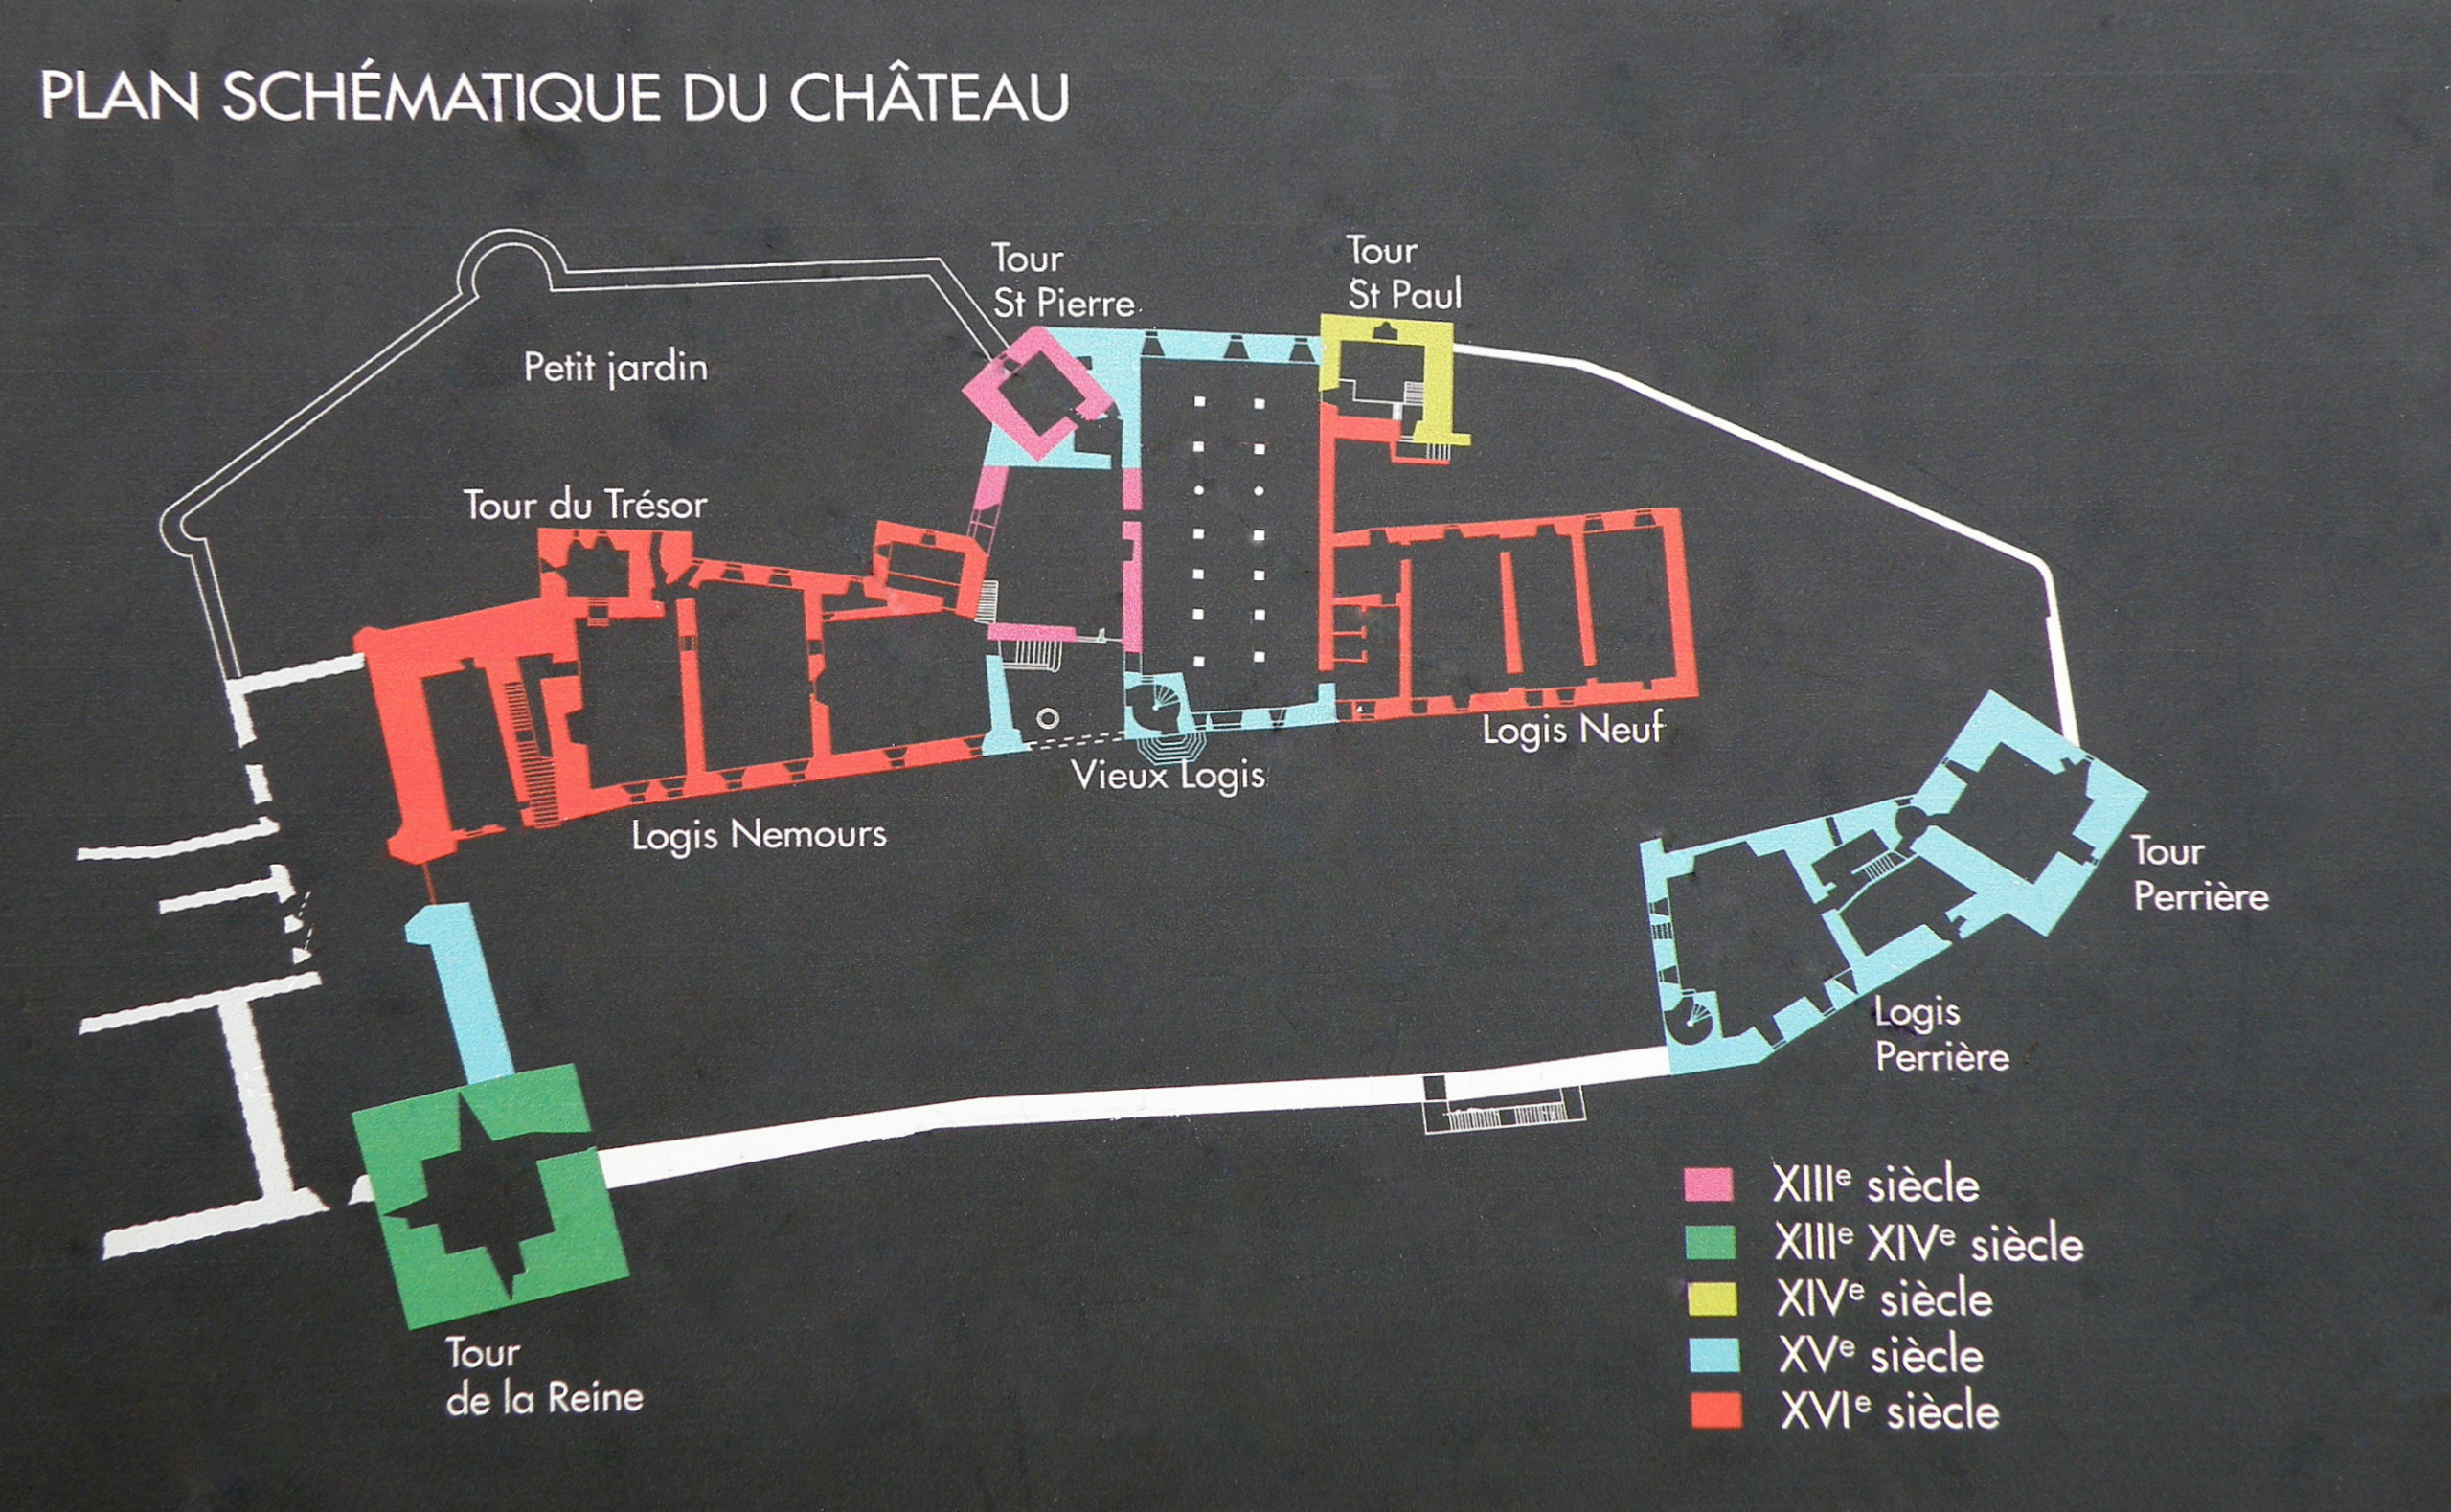 File:annecy Château 15Bis.jpg - Wikimedia Commons concernant Les Jardins Du Château Annecy